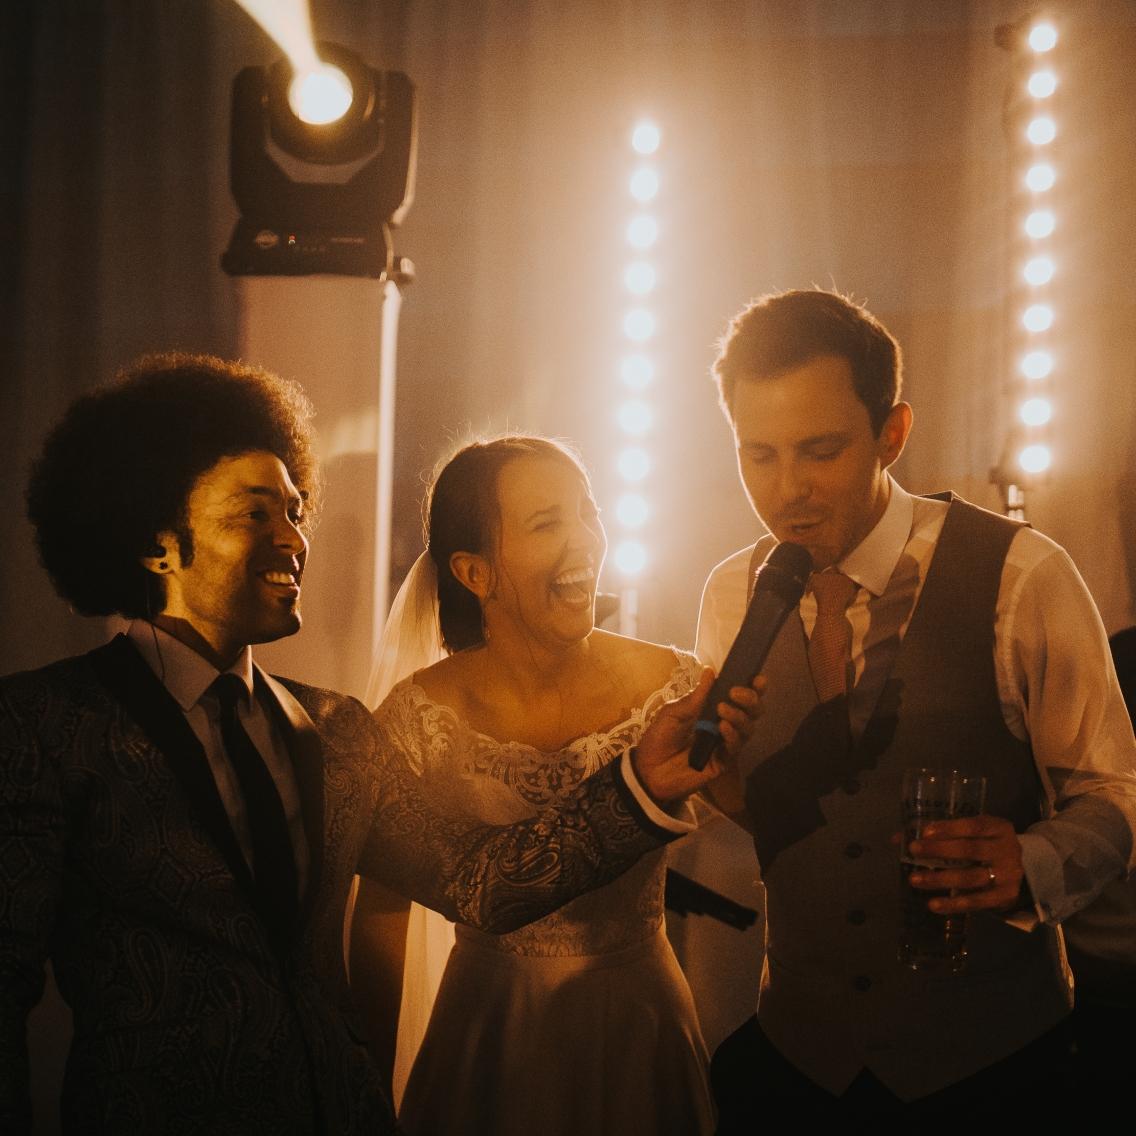 Groom singing on stage at wedding